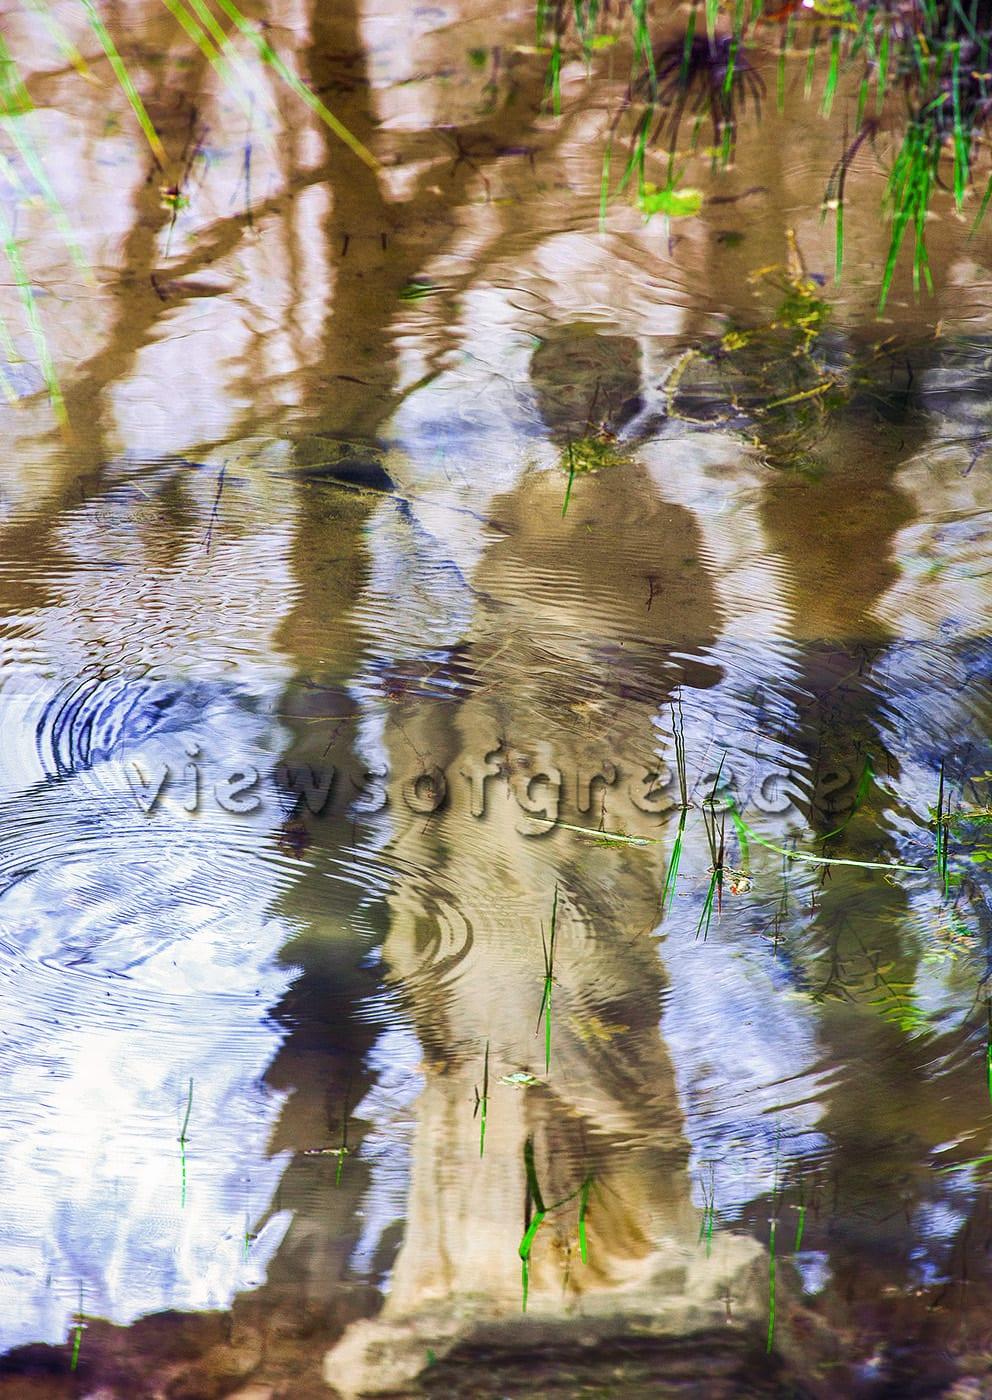 greece, greek, mountain, olympus, litohoro, national park, hiking, litochoro, mitikas, monastery, outdoor, mountainous, dion, Όλυμπος, Λιτόχωρο, μονή Διονυσίου, Ενιπέας, εθνικό πάρκο, Δίον